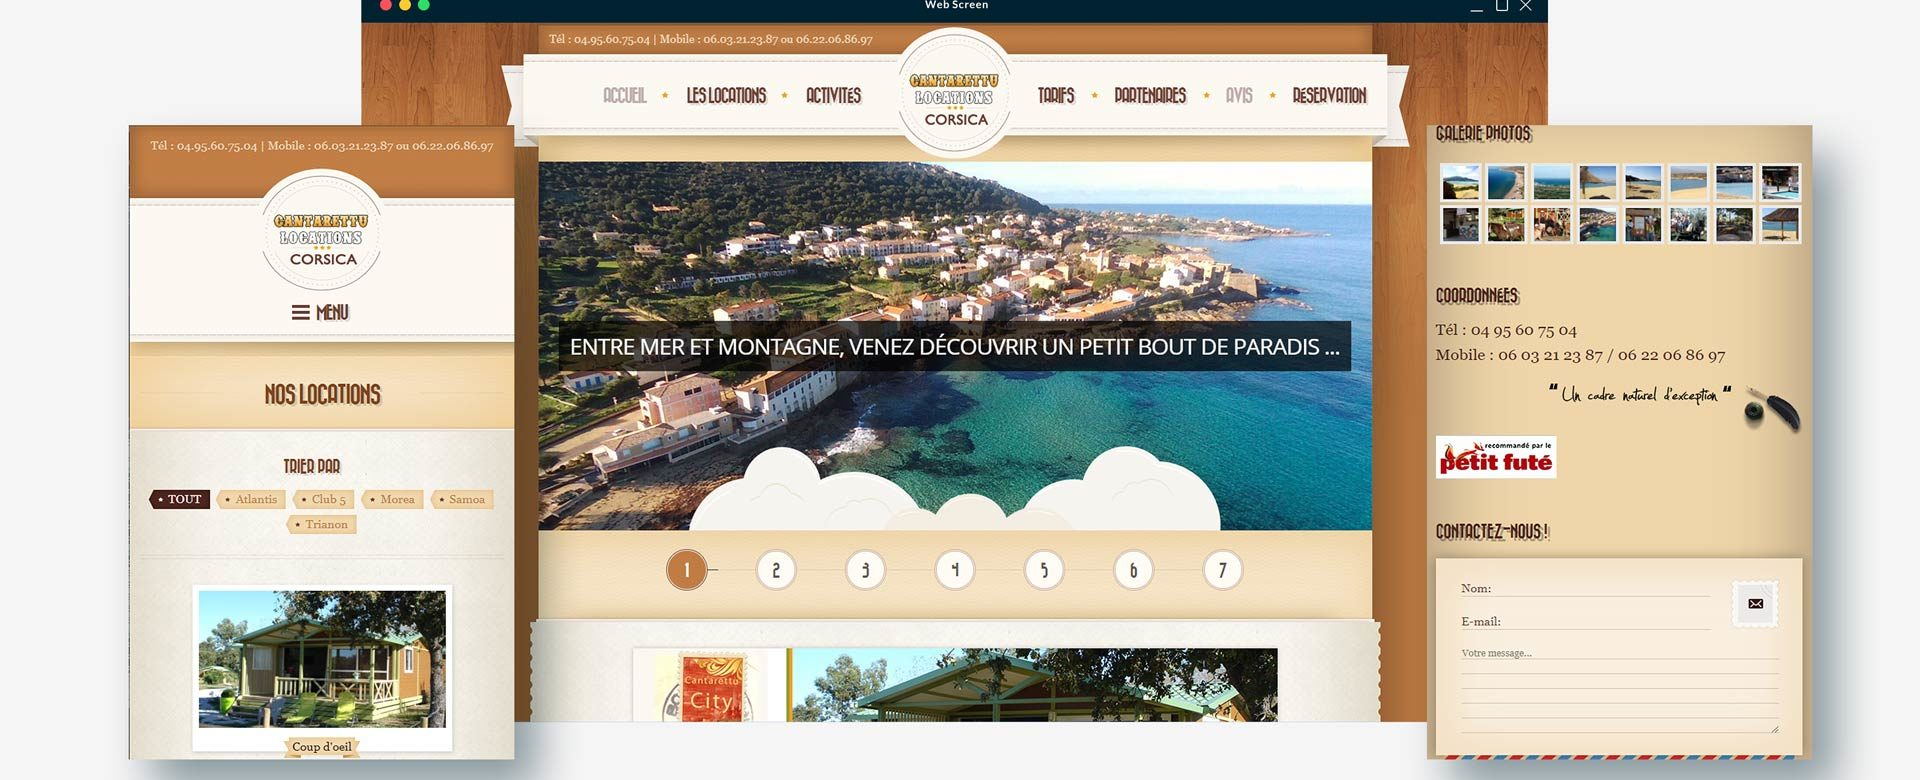 cantarettu-locations-site-web-corse